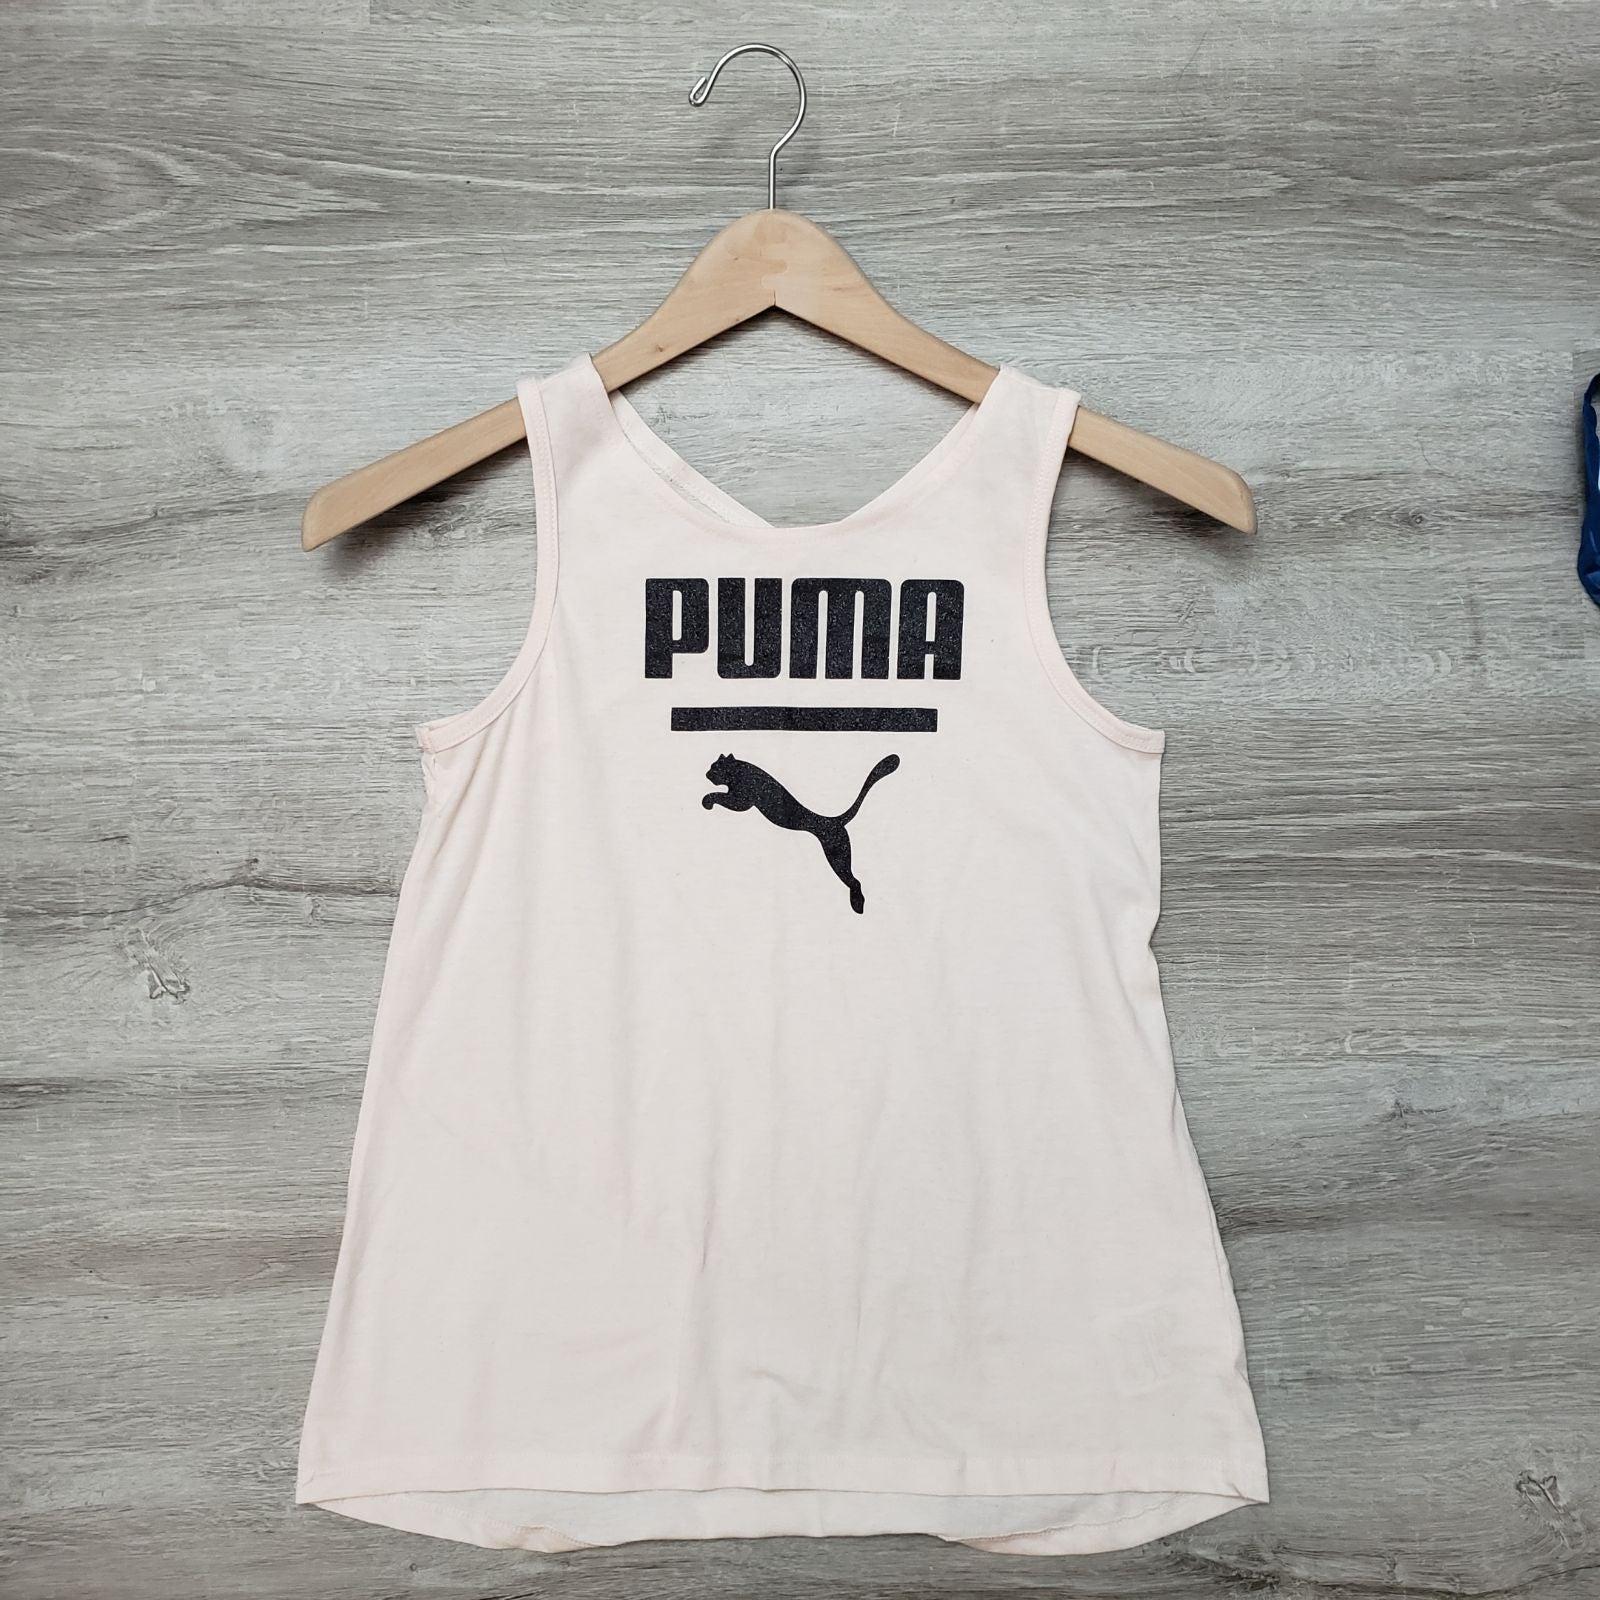 Puma girls large workout tank top